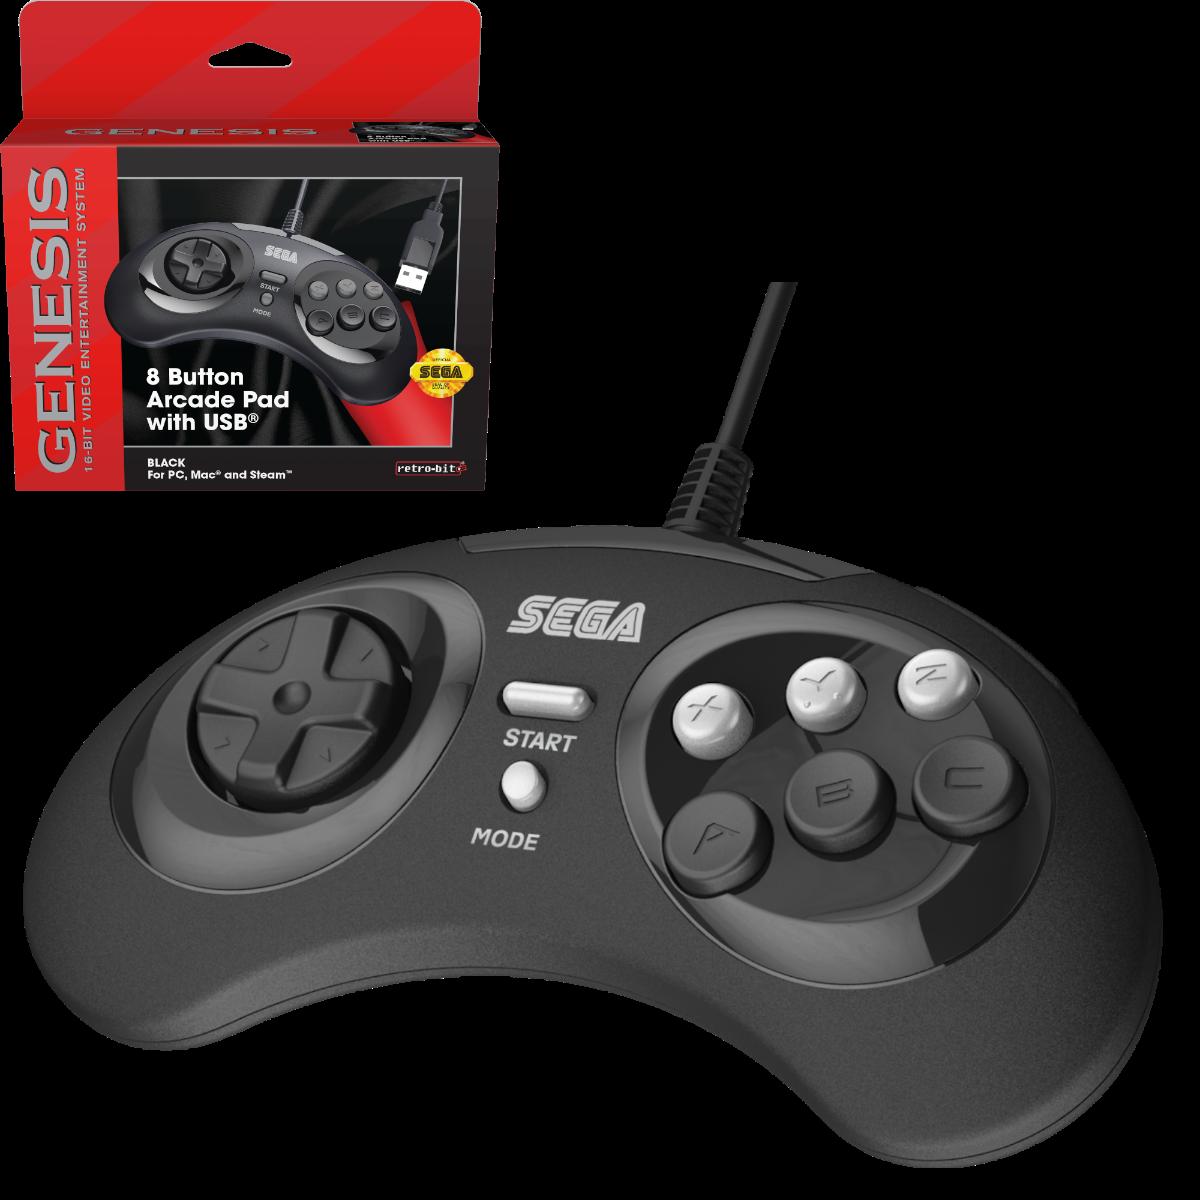 SEGA, Genesis, Arcade Pad, 8 Button, Black, USB